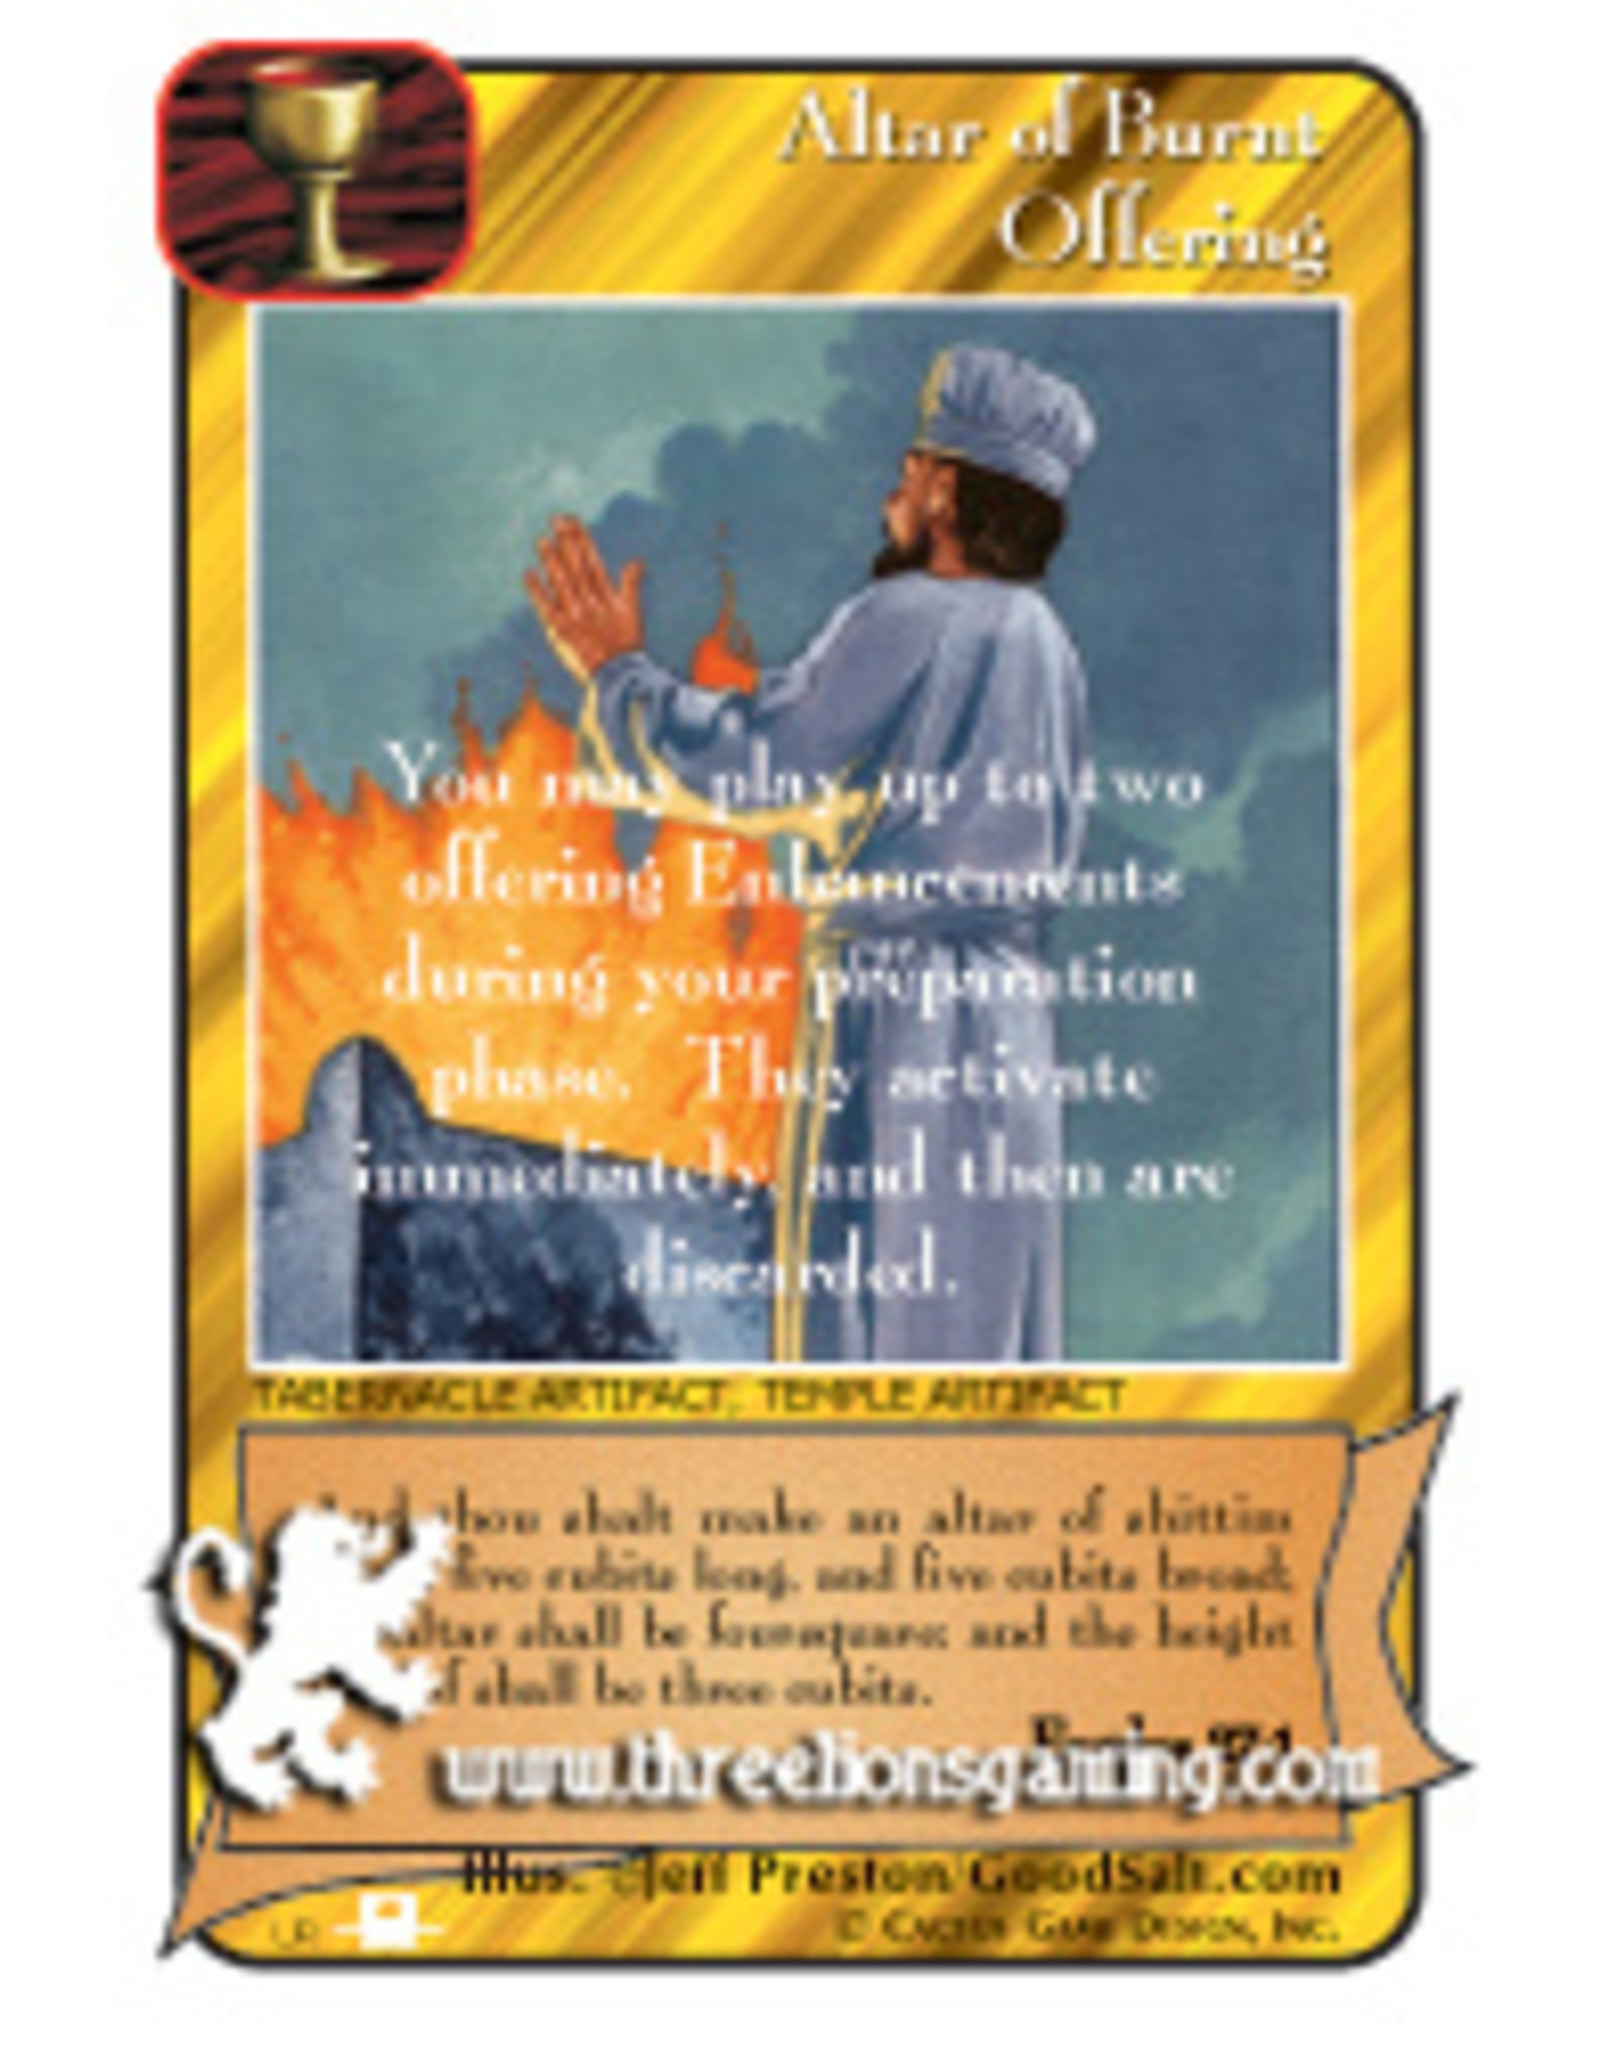 Priests: Altar of Burnt Offering